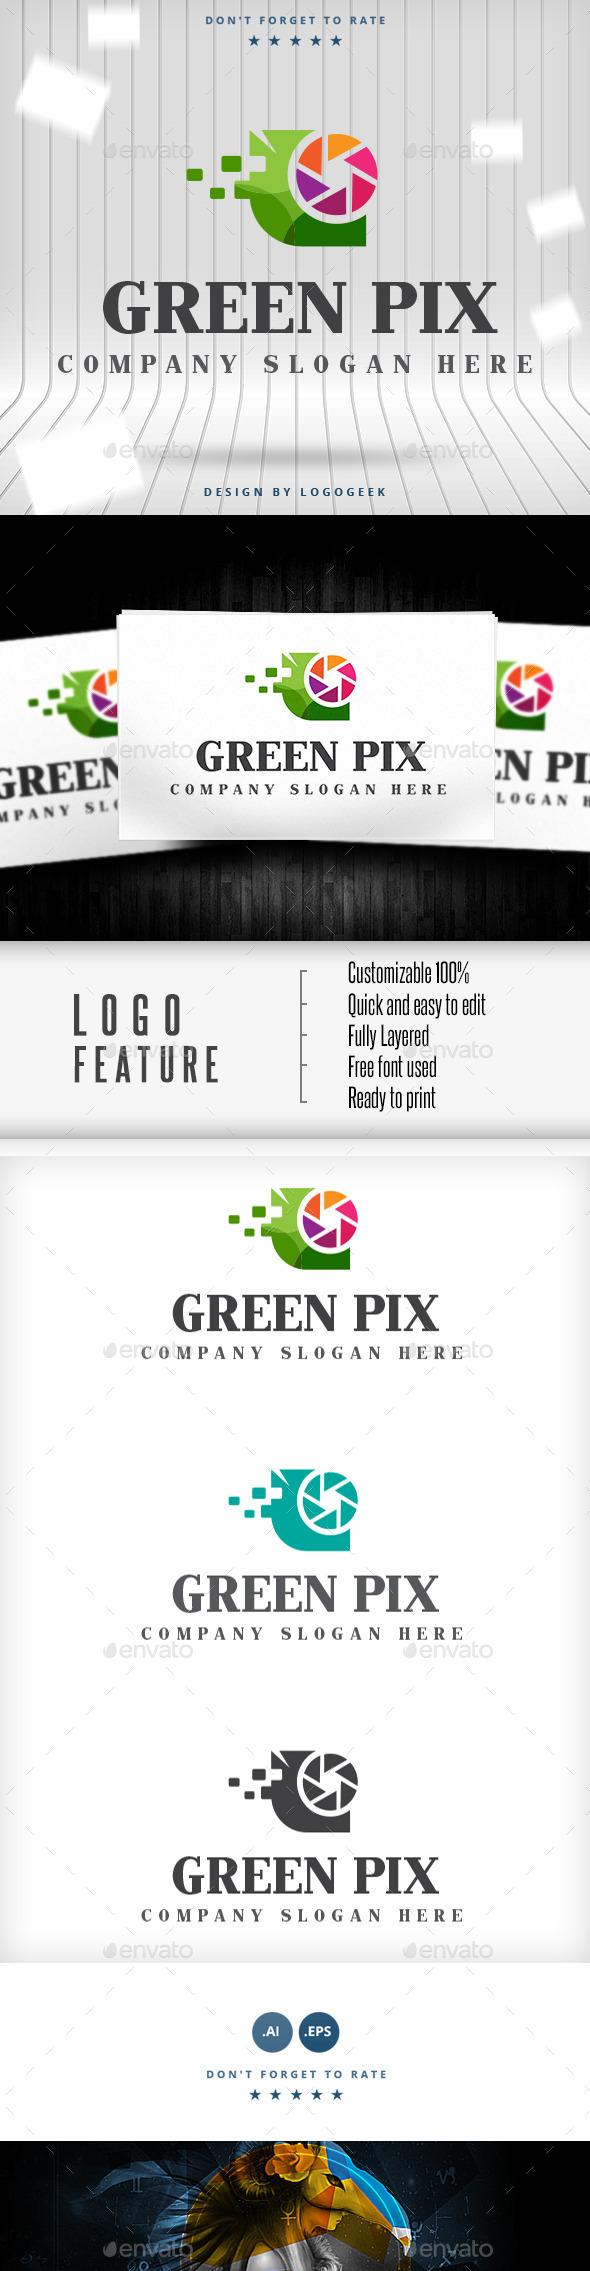 Green Pix Logo - Logo Templates